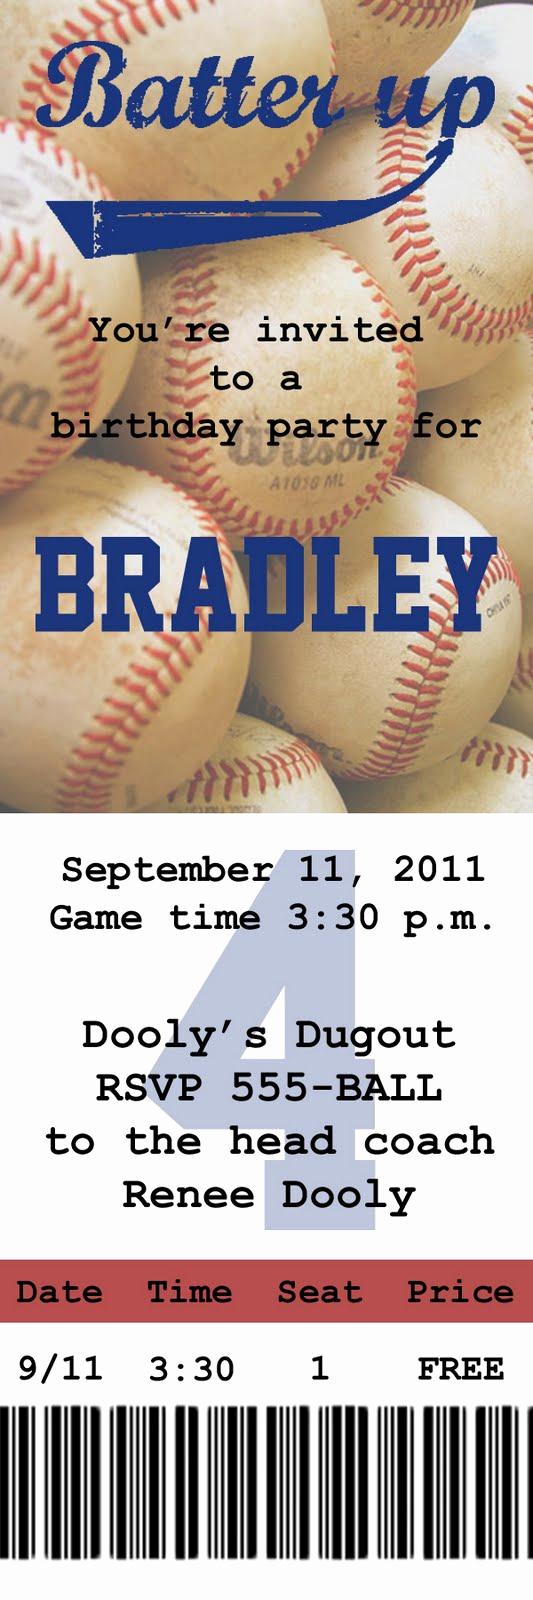 Baseball Ticket Invitation Template Free Fresh Gobs Of Giggles Baseball Party Invite